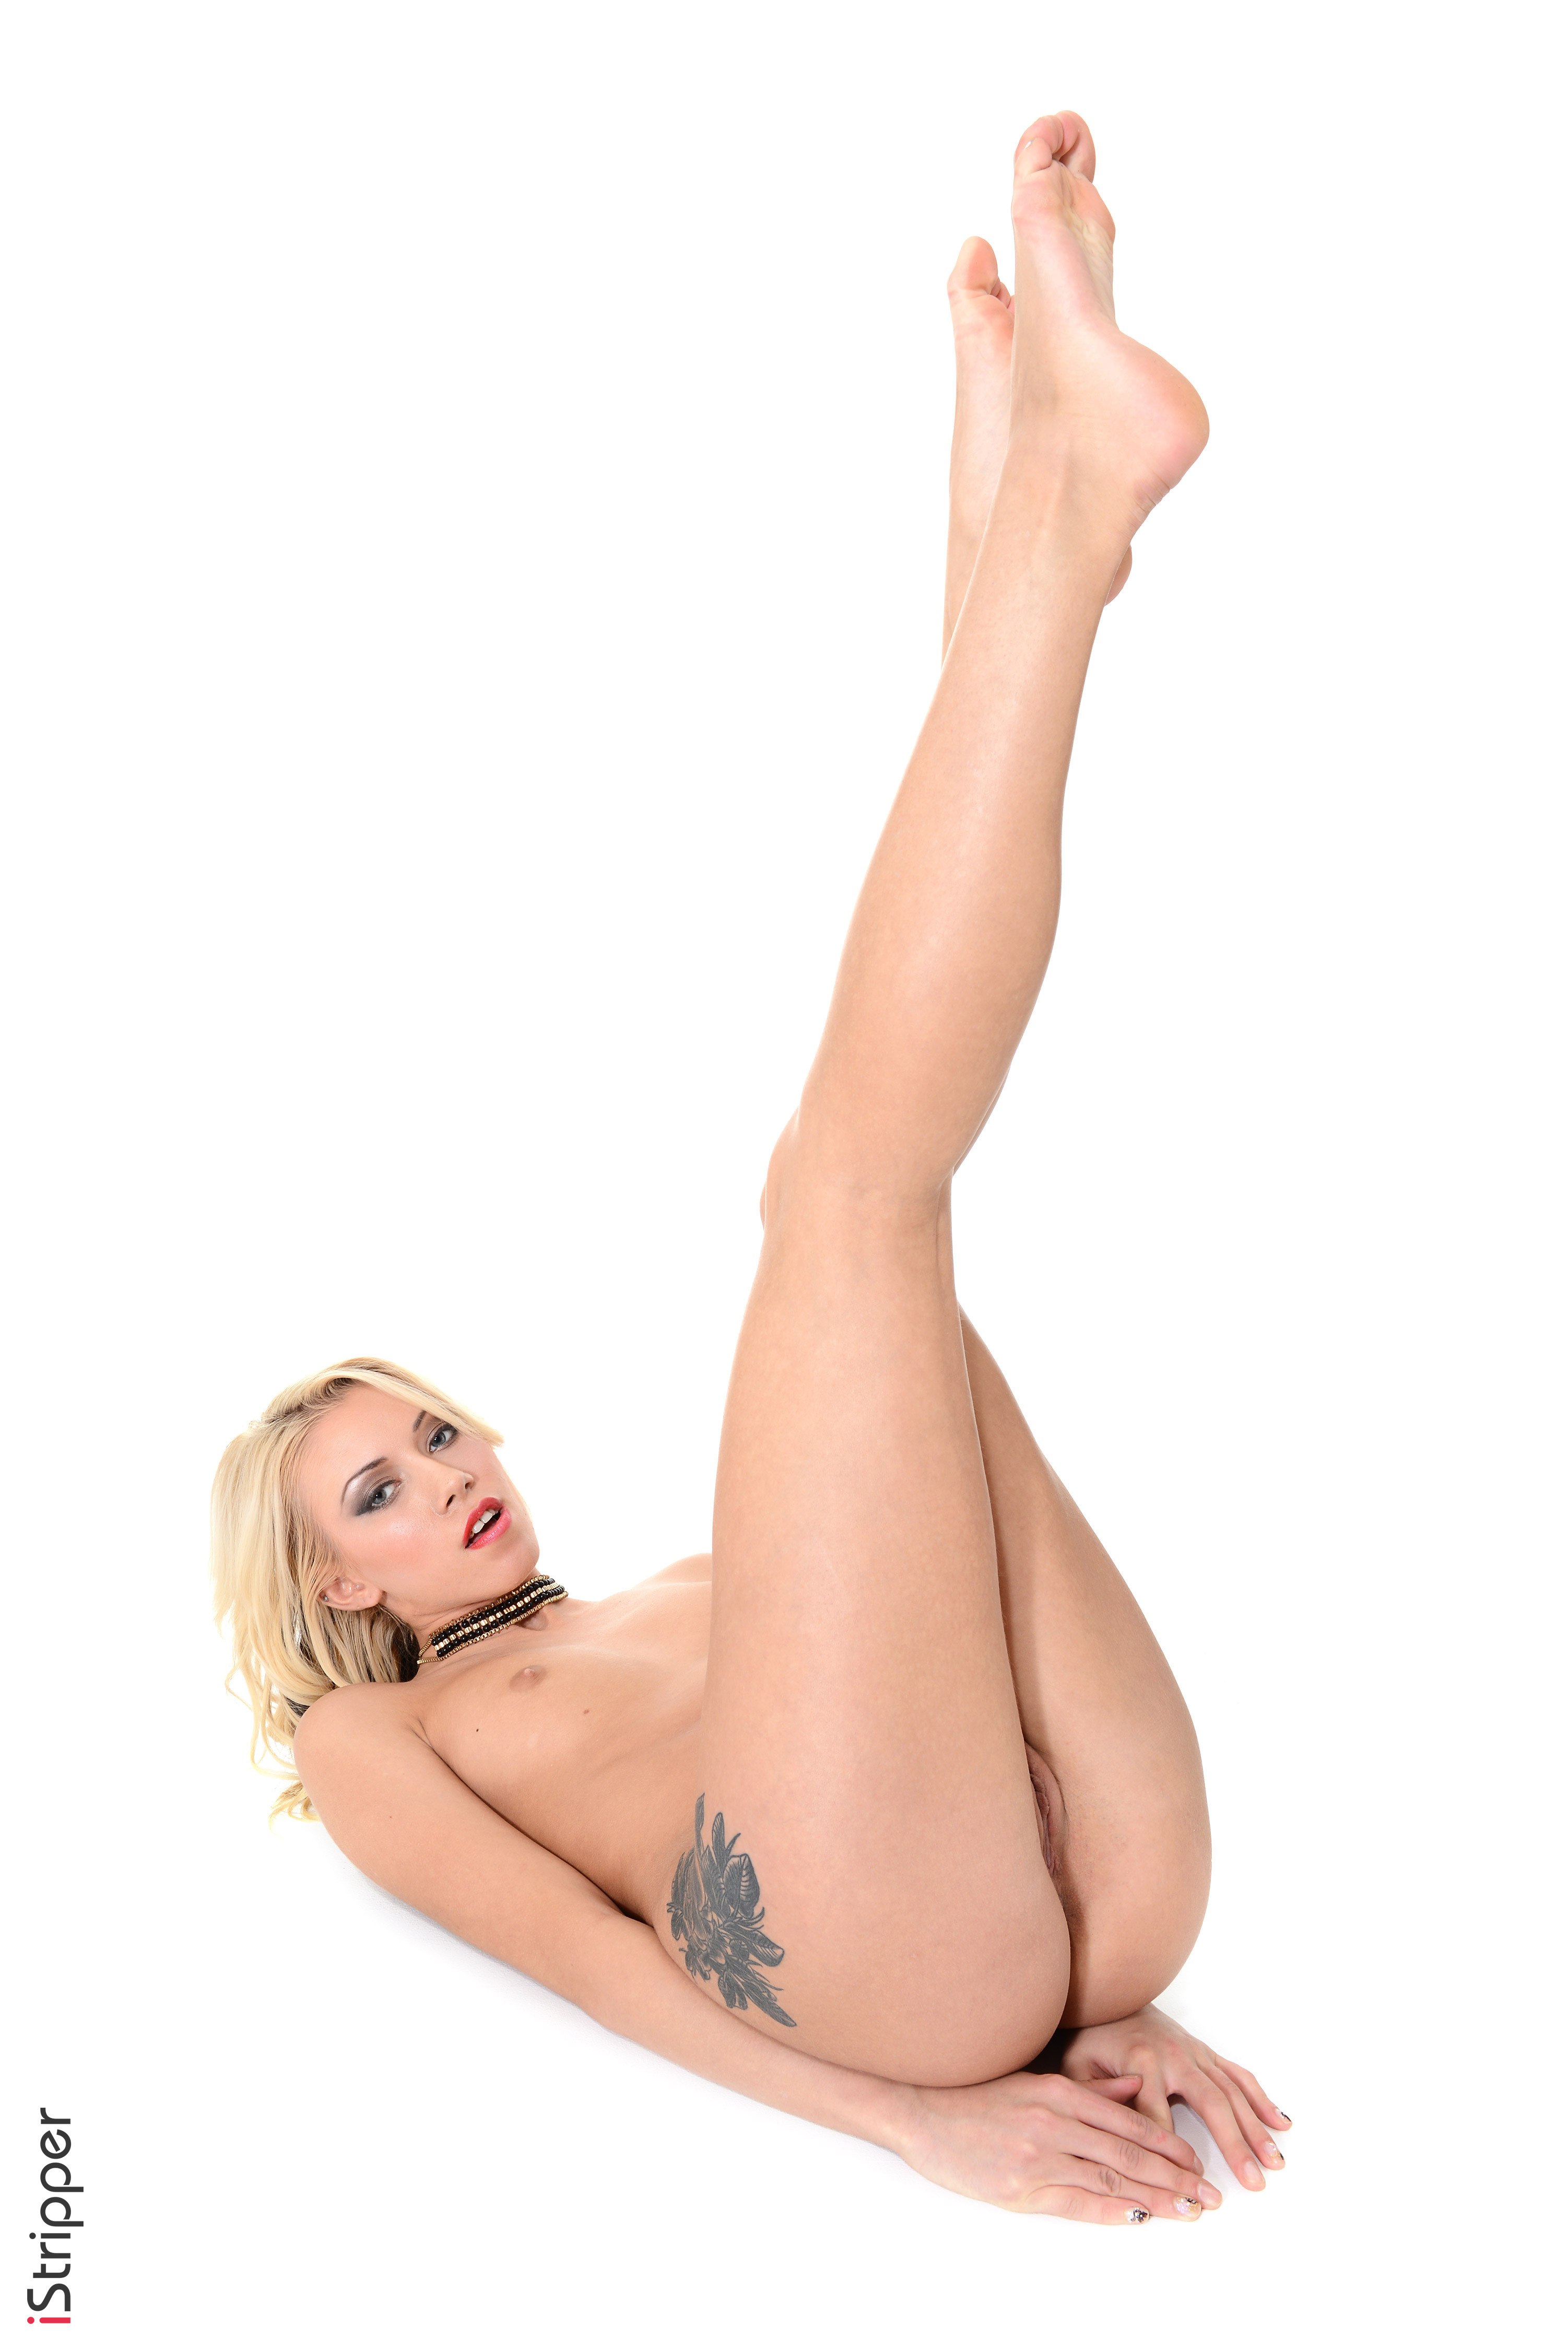 girls tits wallpaper